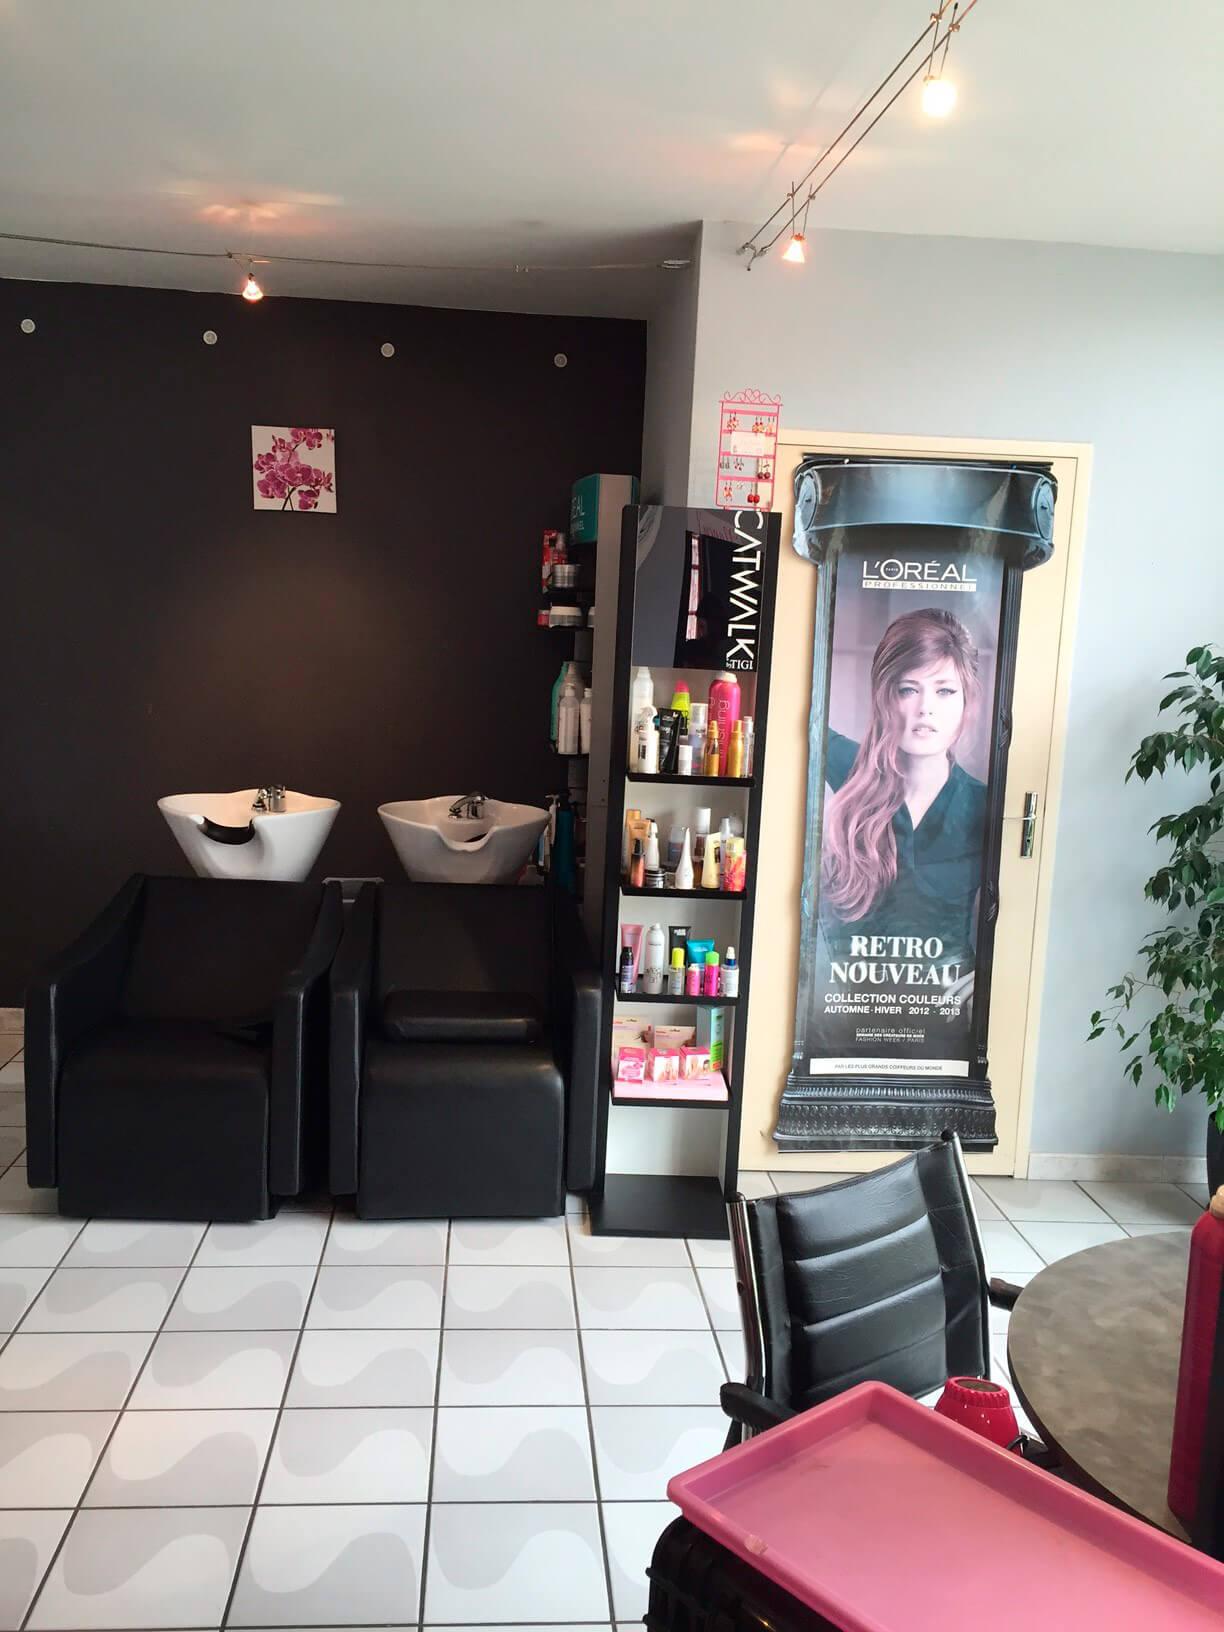 Le Jardin de la Coiffure | Salon de coiffure à Guitalens-l\'Albarède